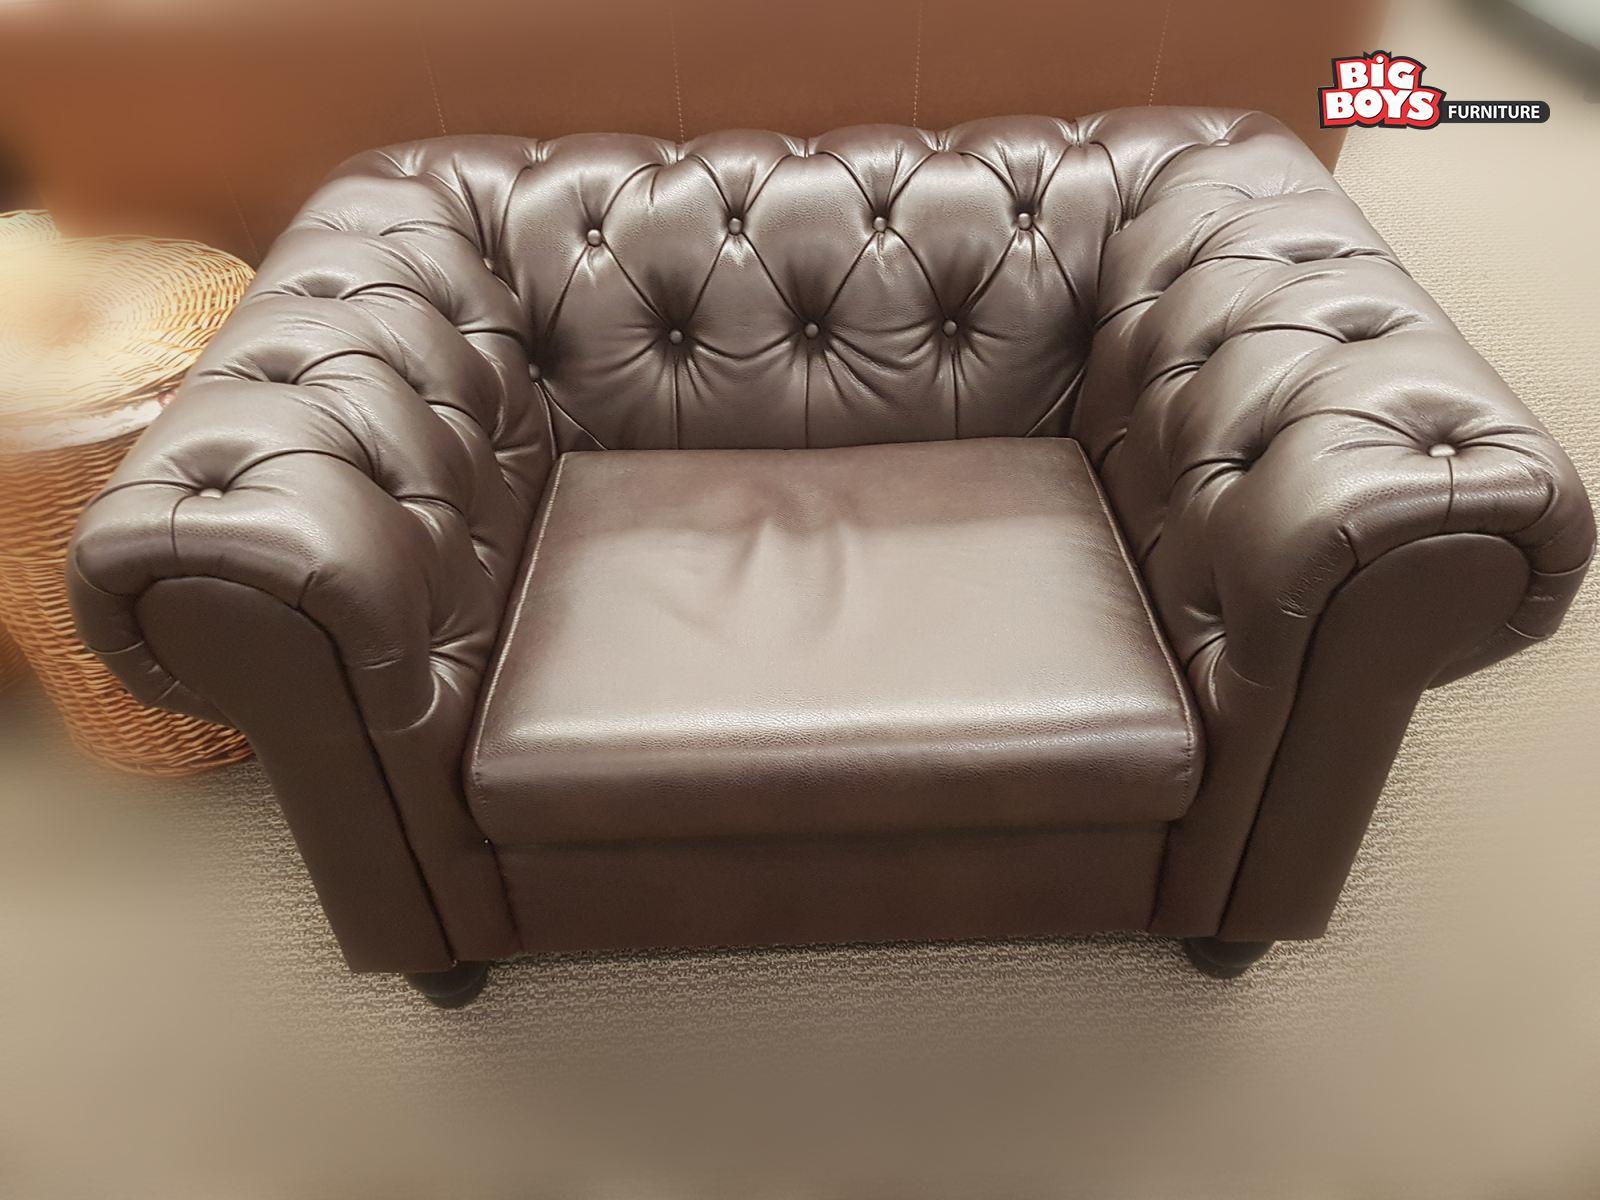 Elegant Sofas at Big Boys furniture